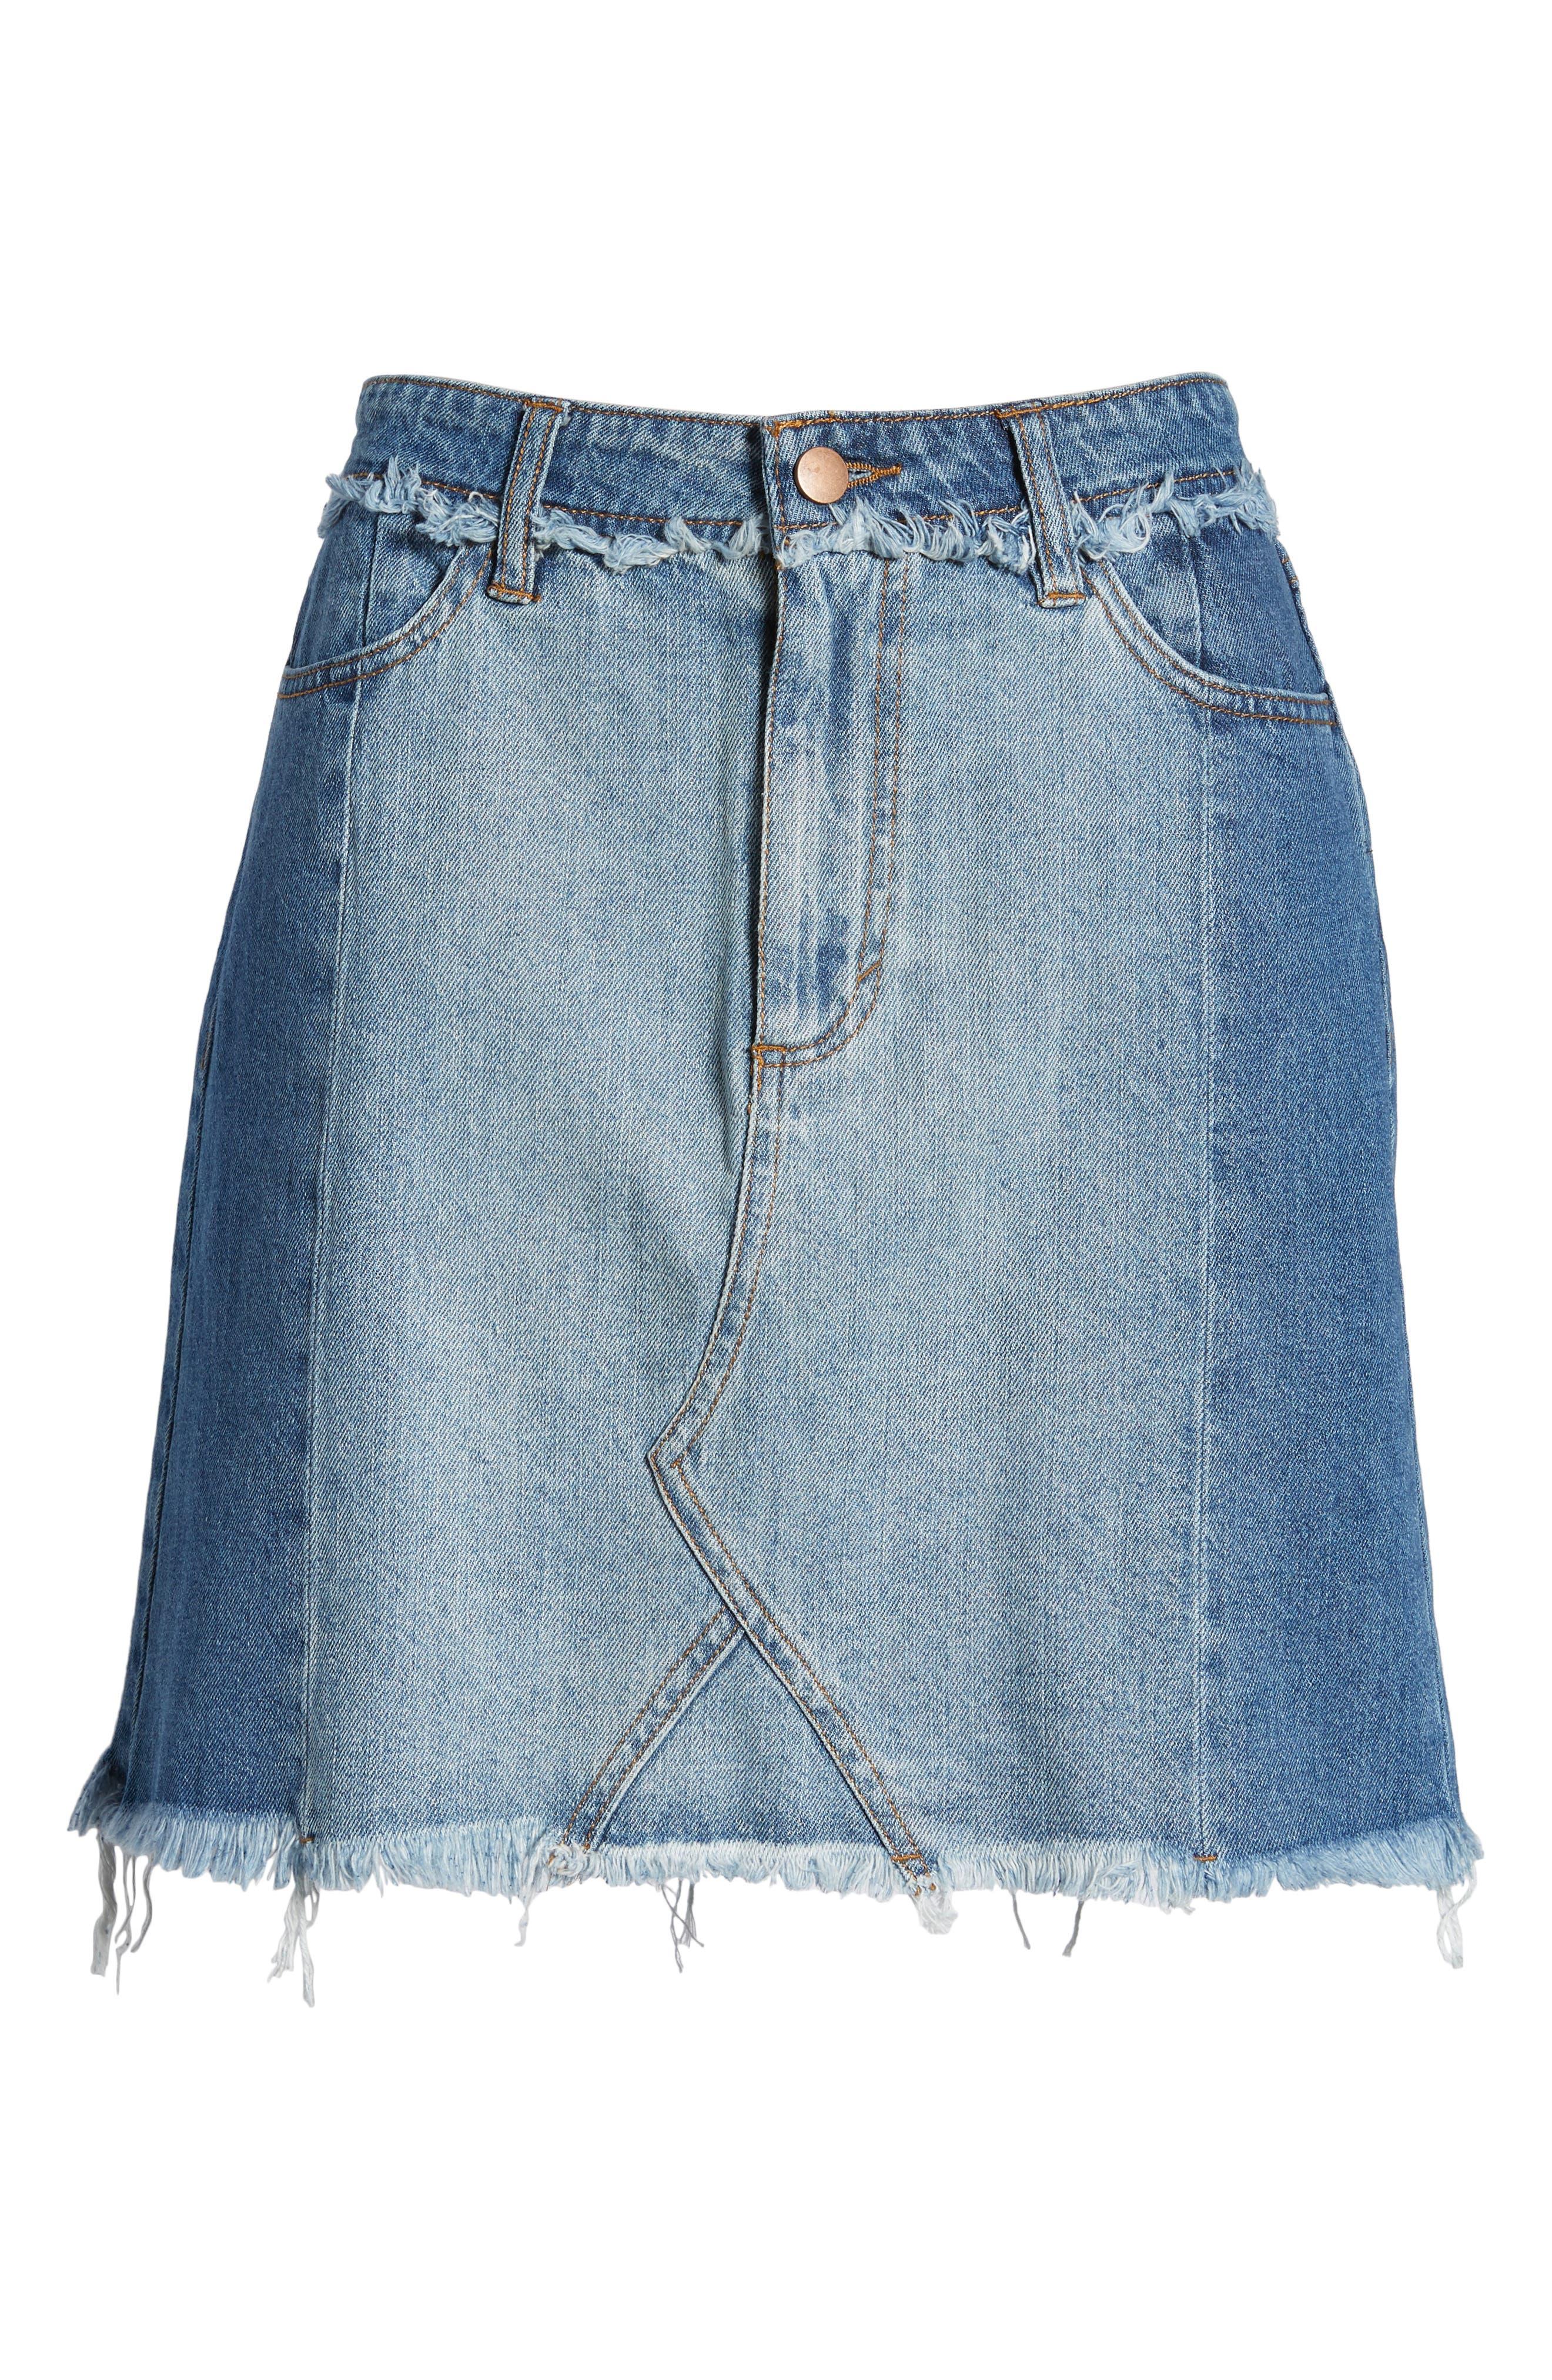 Color Block Denim Skirt,                             Alternate thumbnail 7, color,                             Med Wash